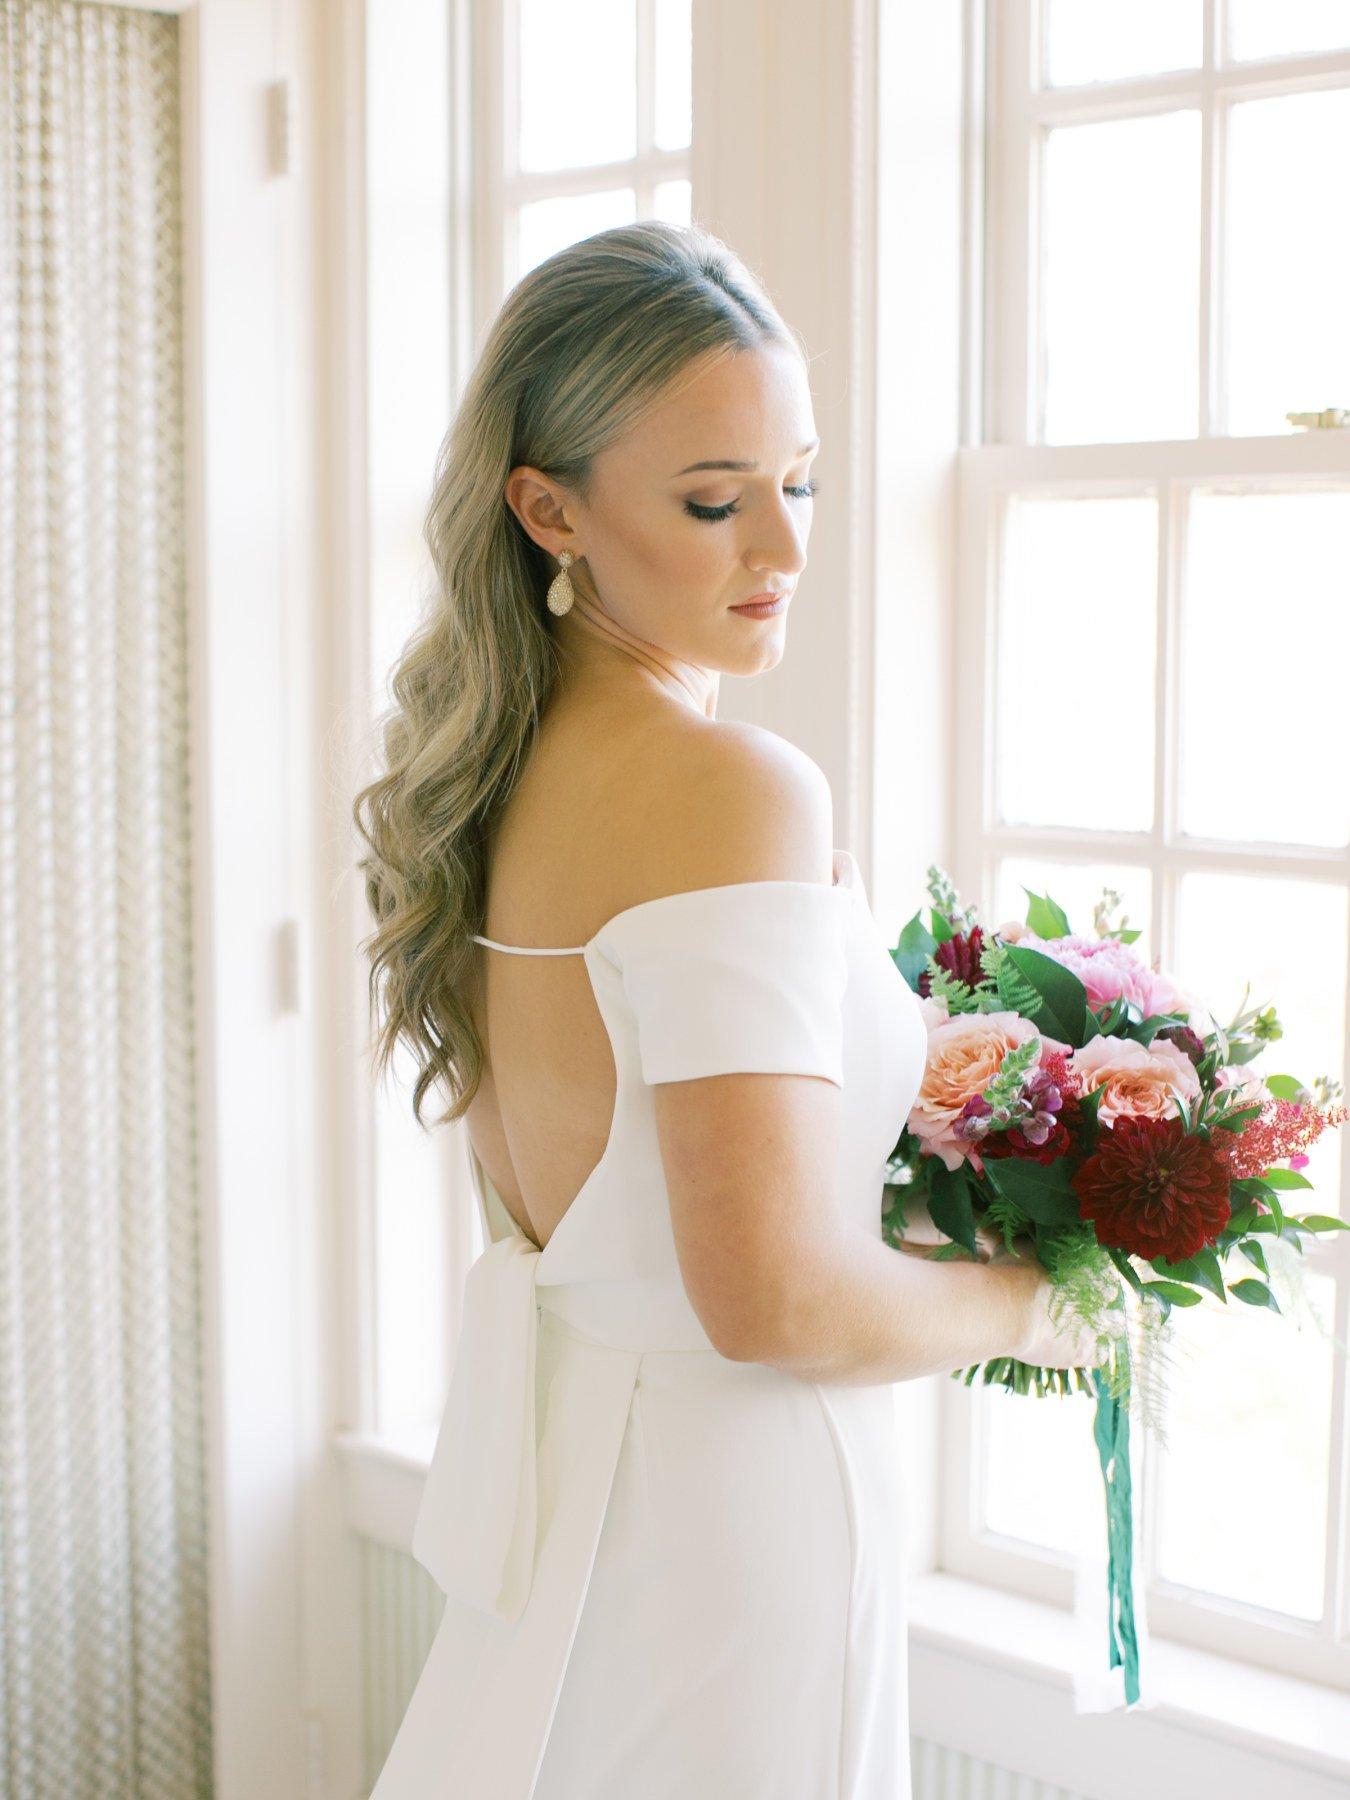 15Great_Marsh_Estates_Wedding_Anne_Kelley_Events_Astrid_PhotographyAP_01623